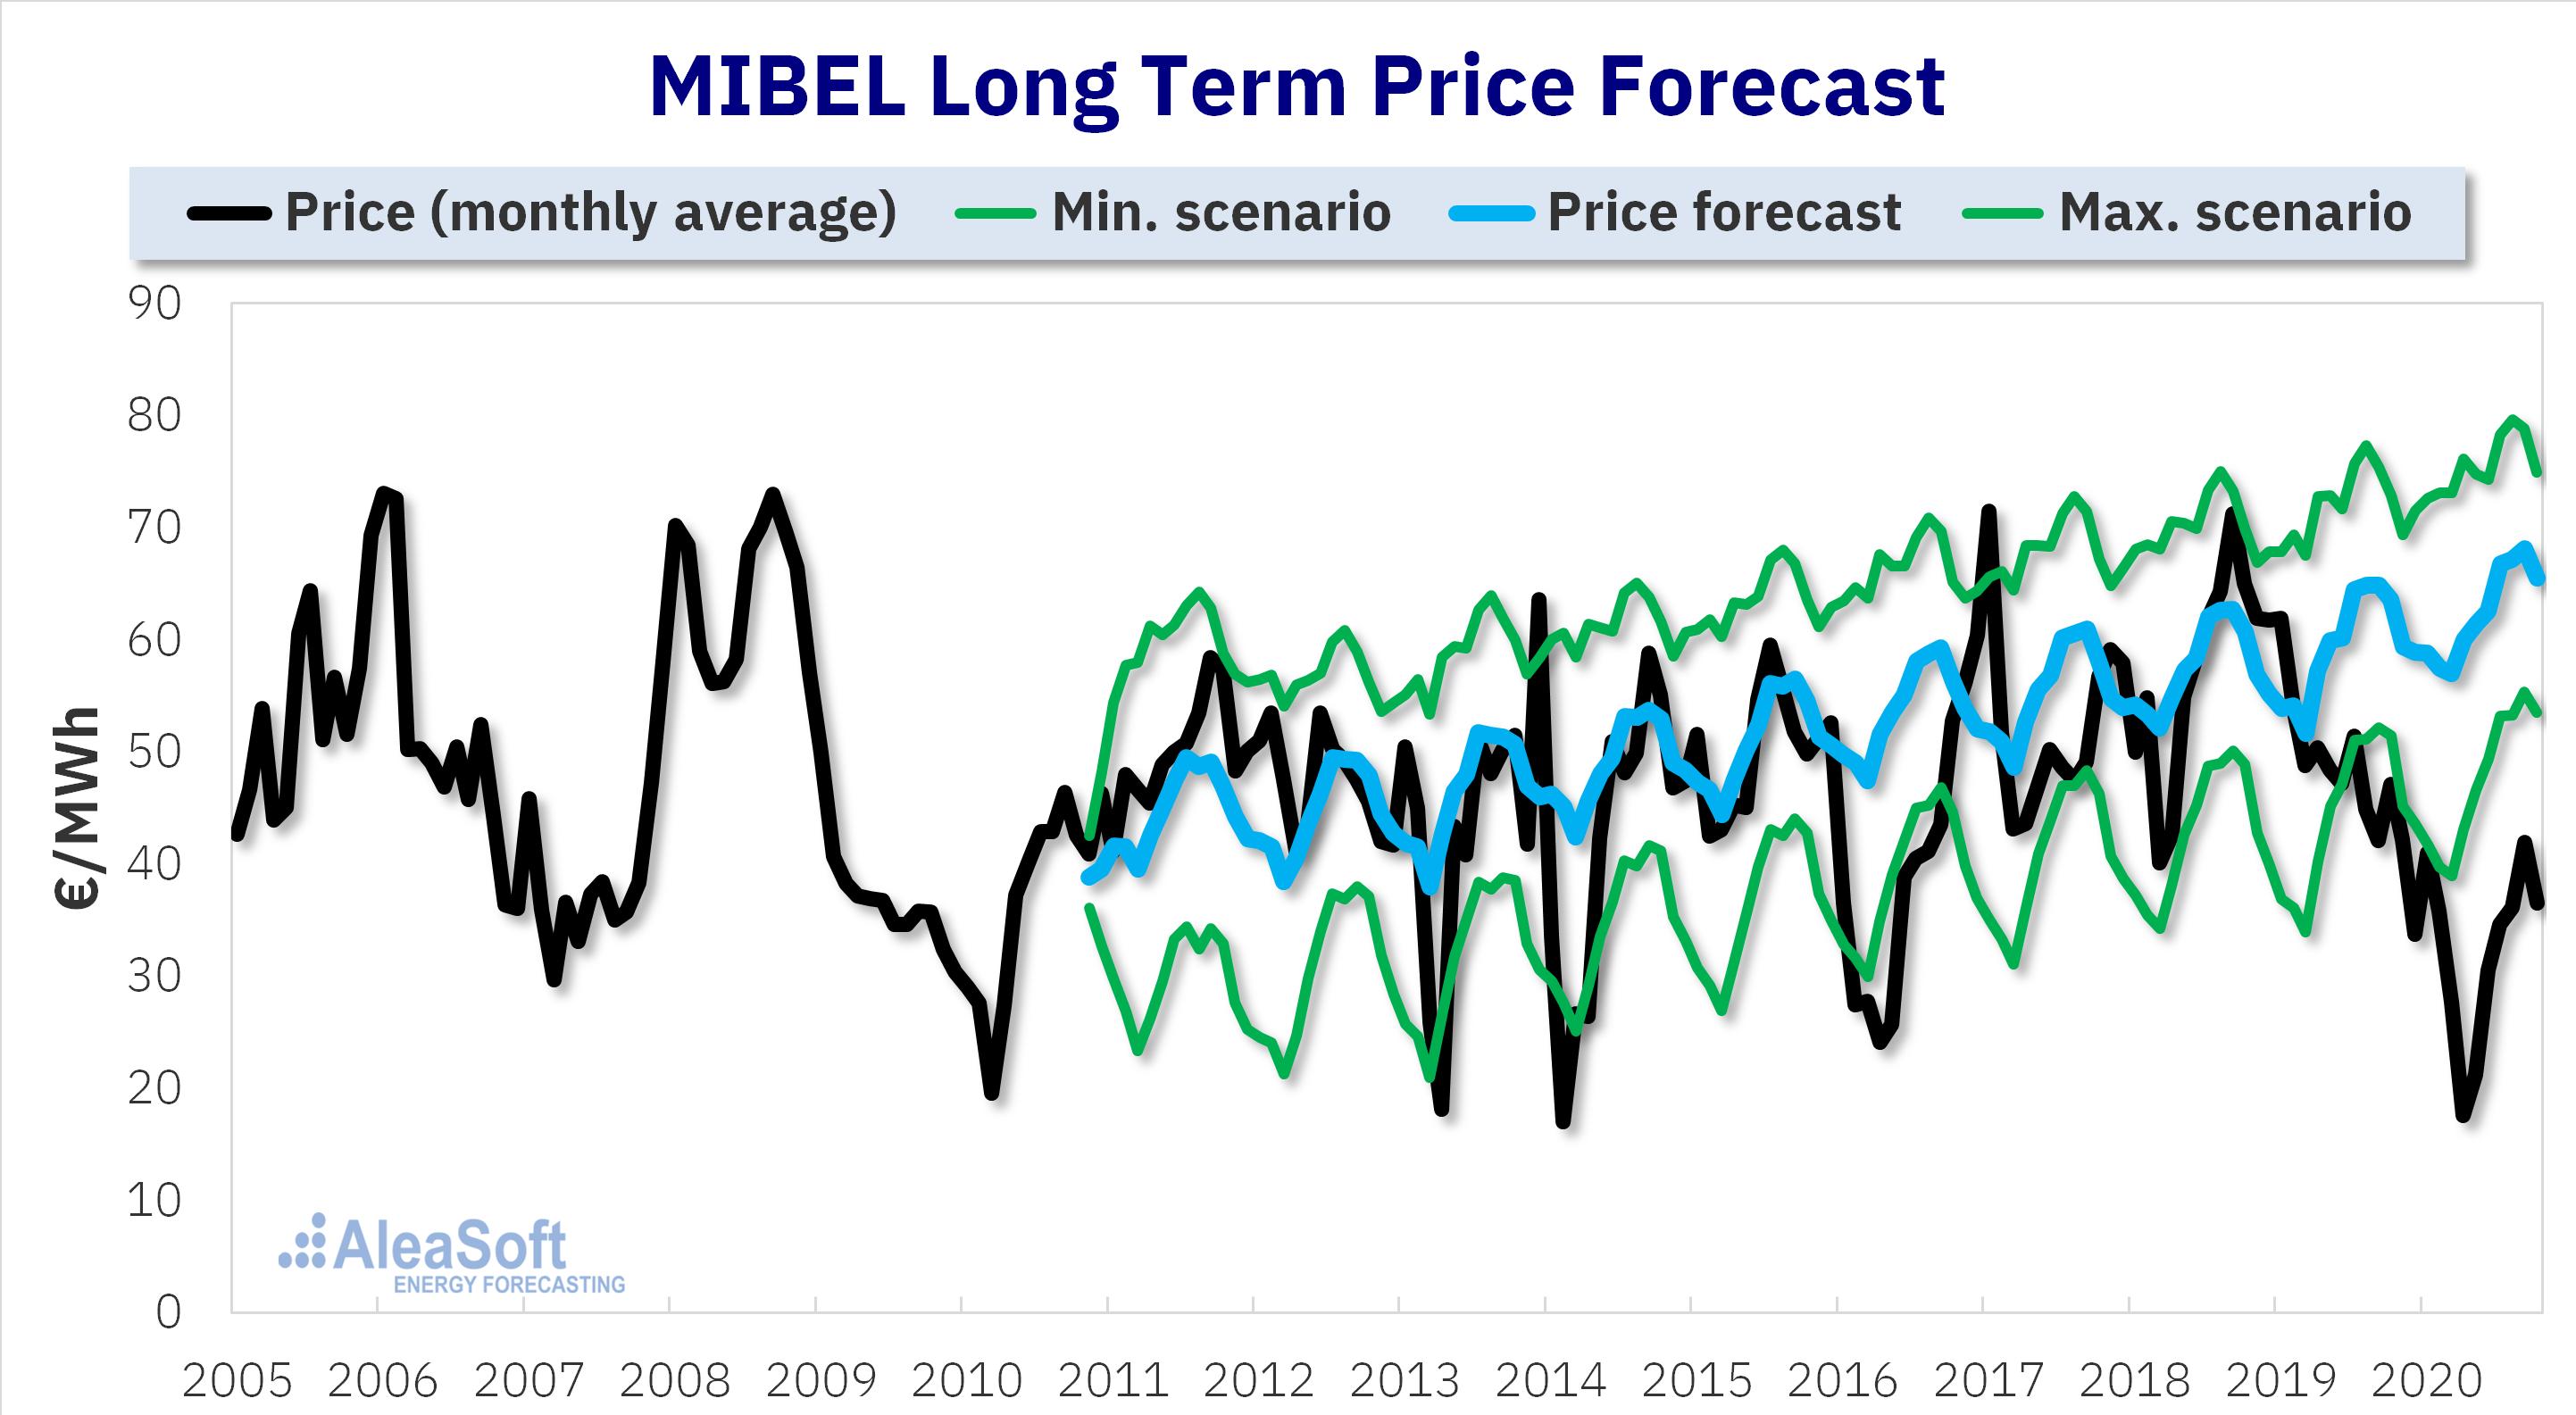 AleaSoft - mibel market long term price forecasting